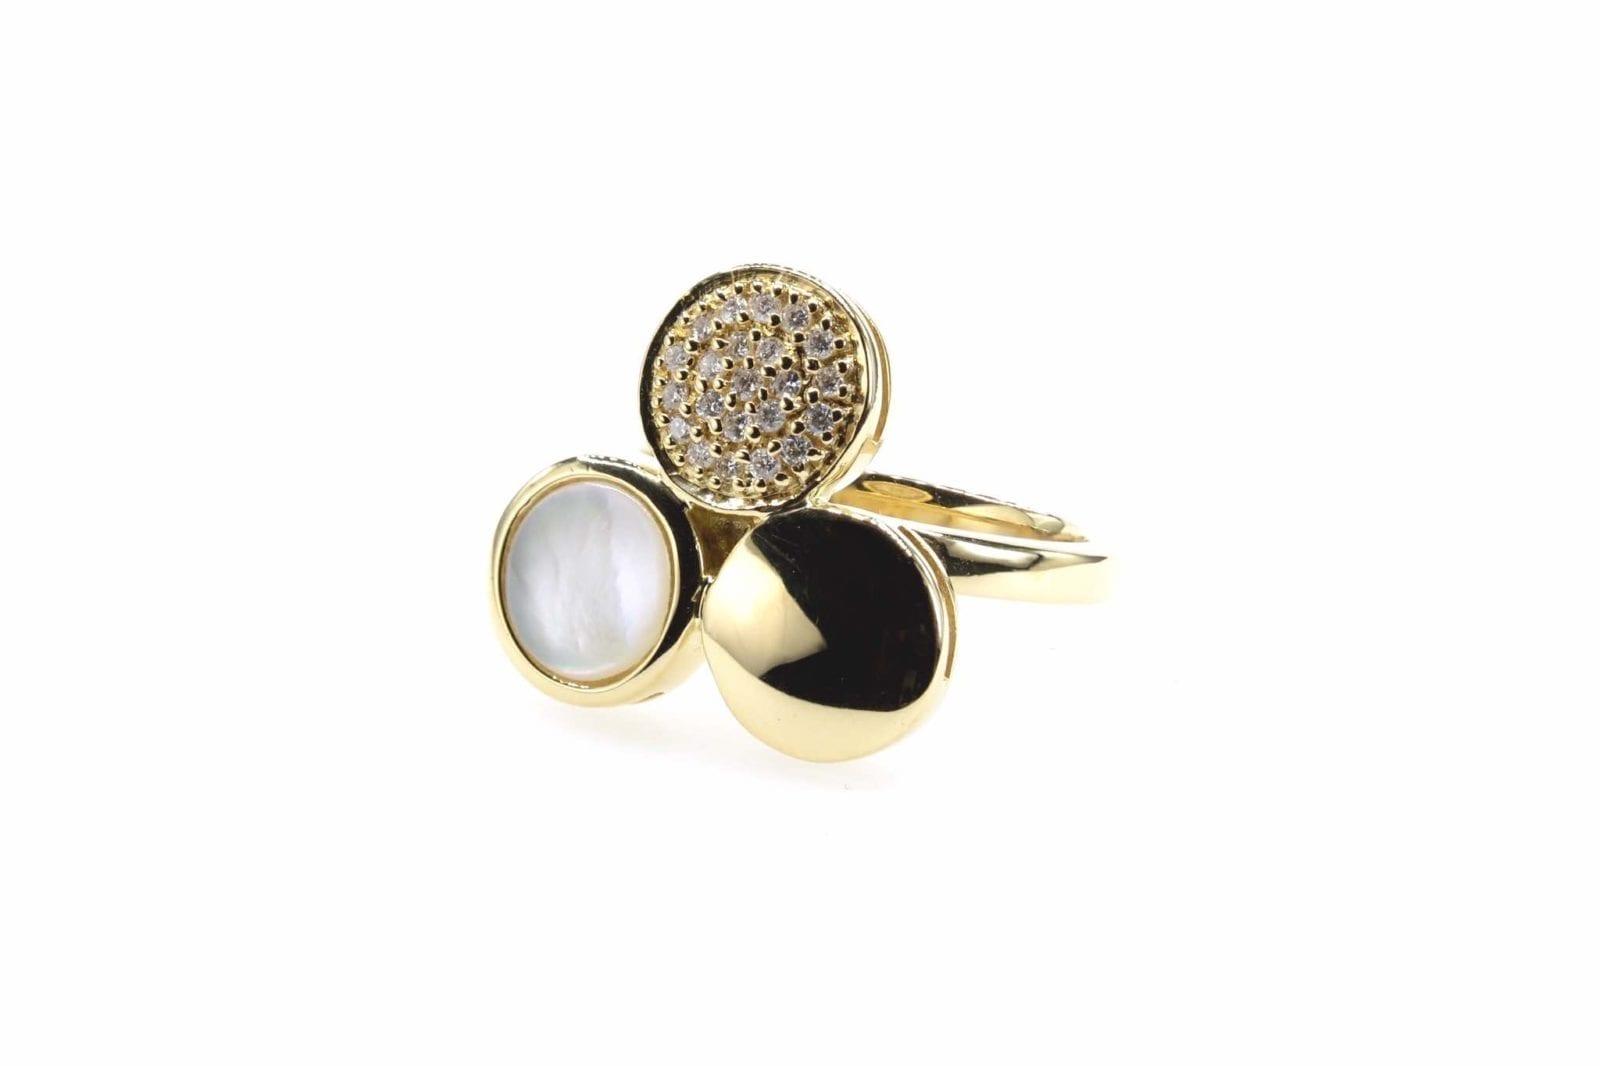 Bague nacre et diamants en or jaune 18k